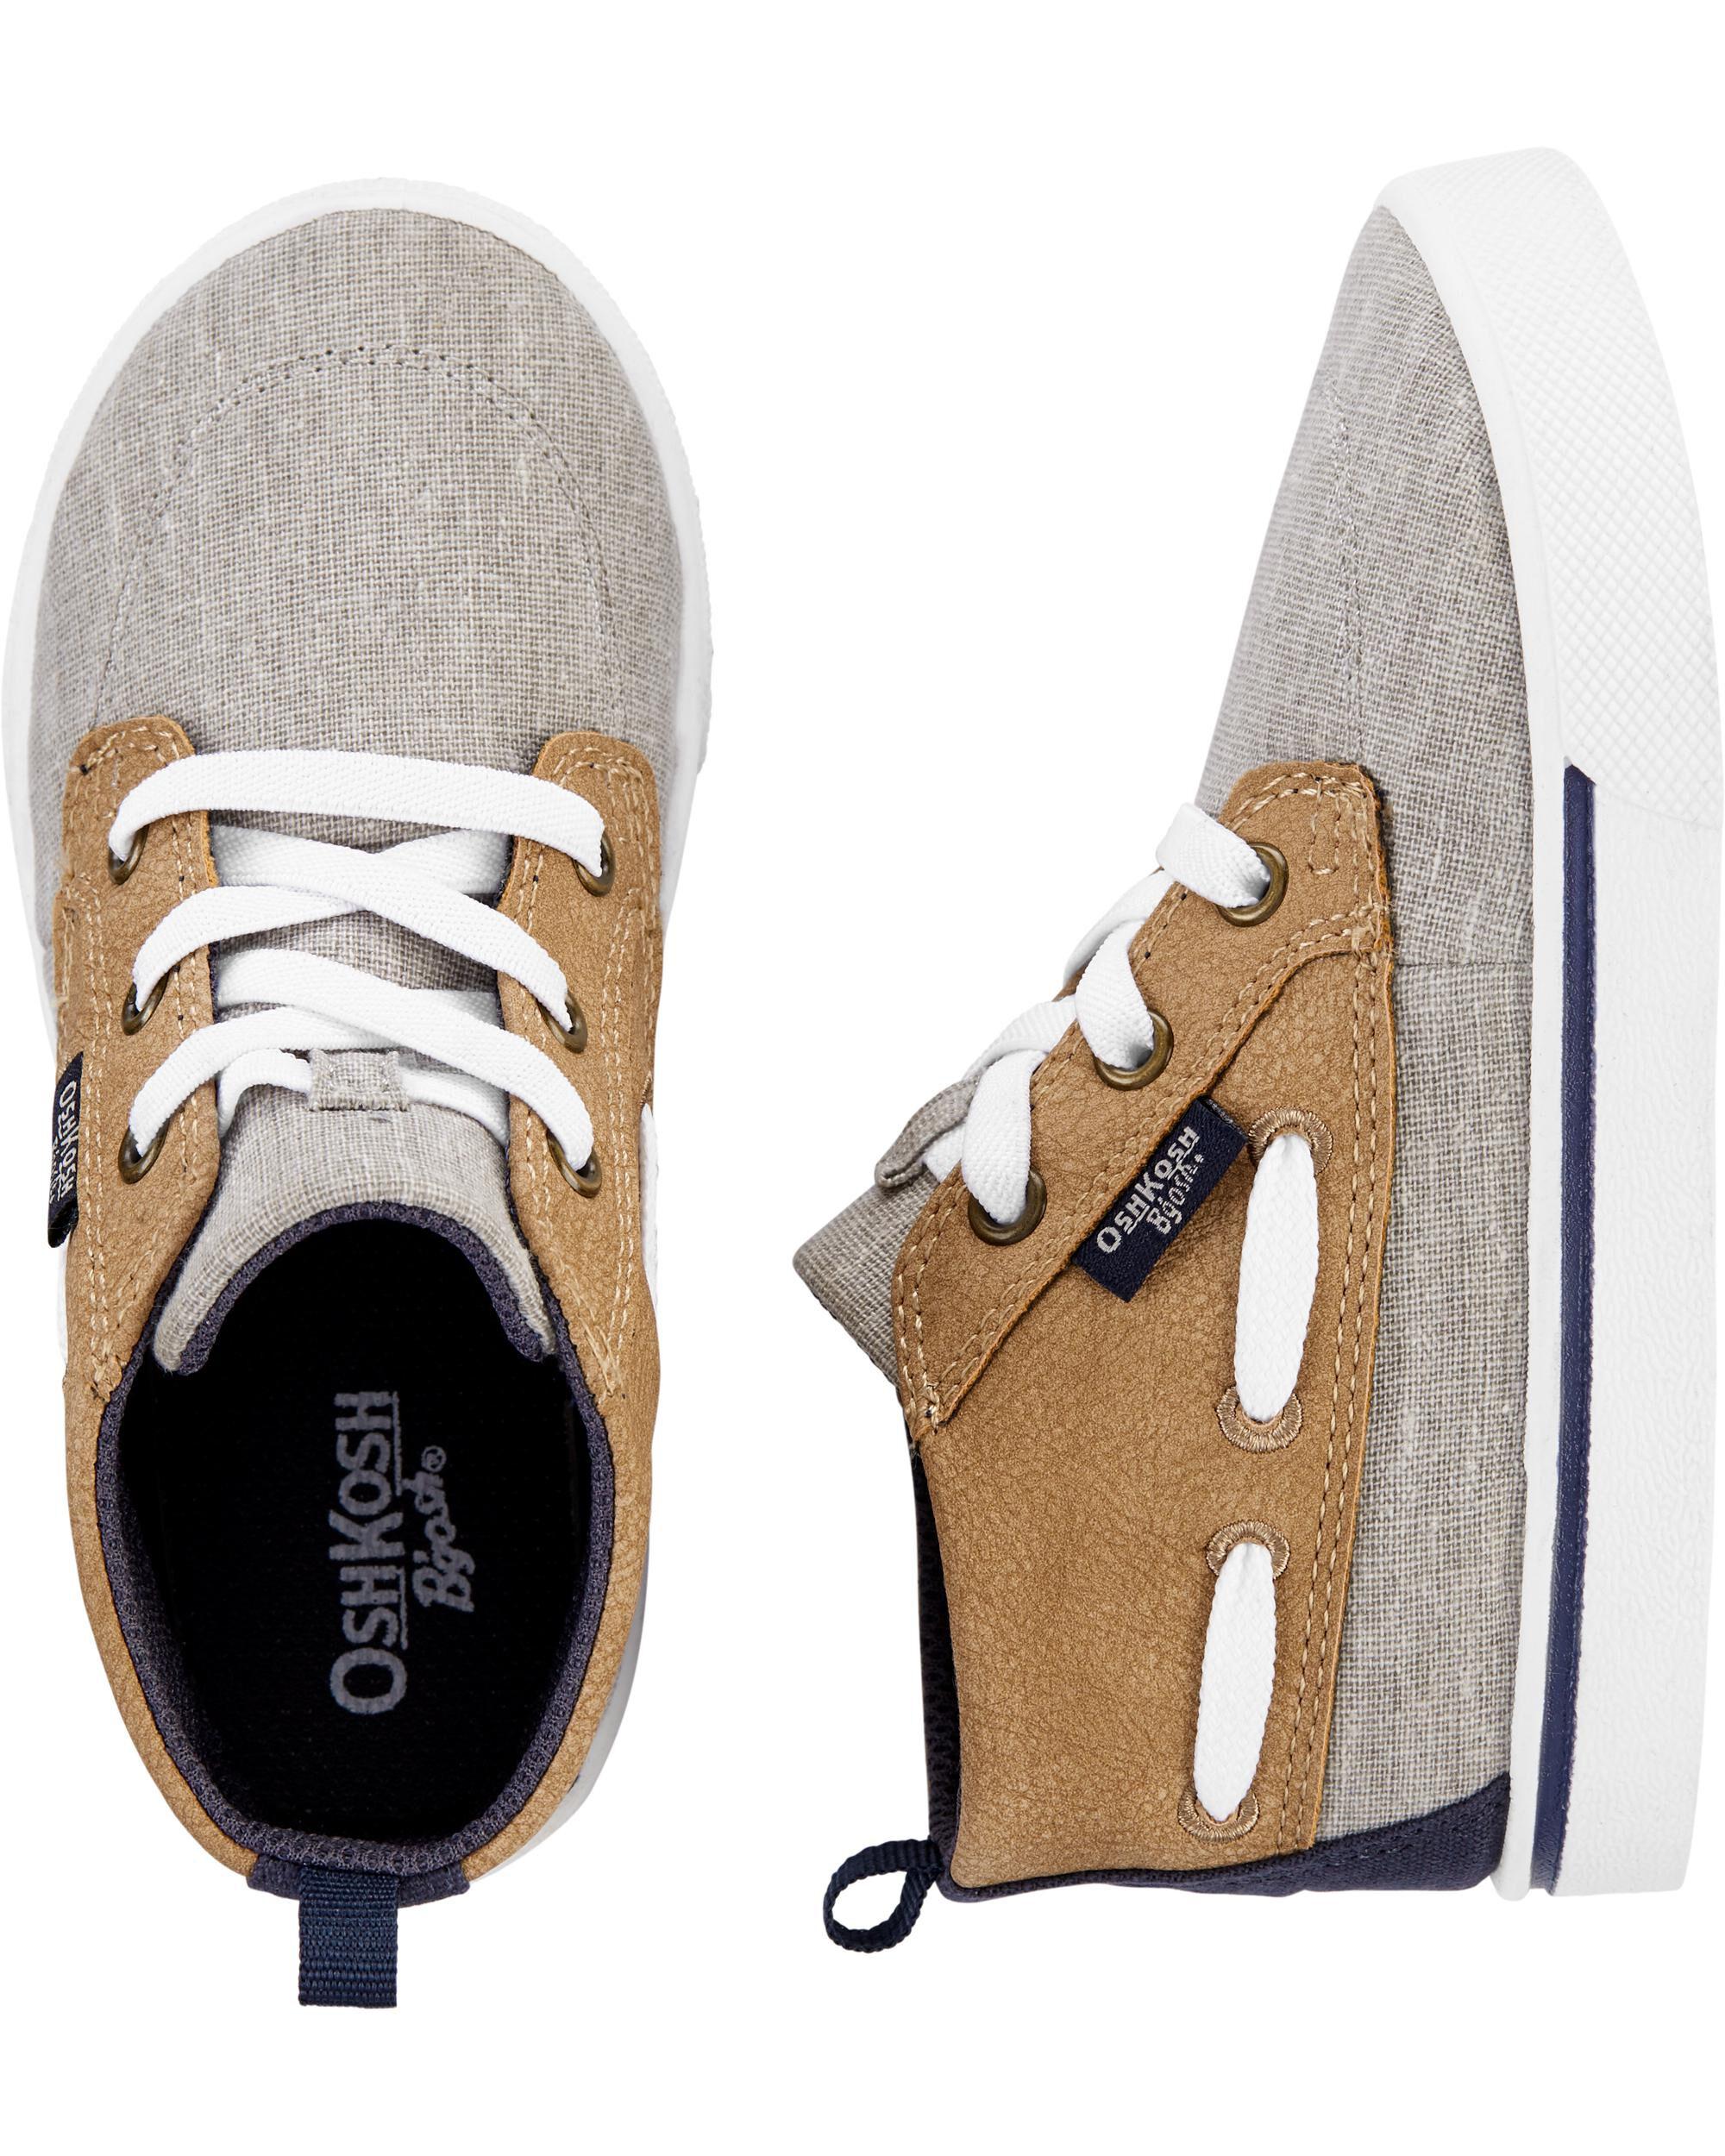 OshKosh High-Top Boat Shoes | oshkosh.com